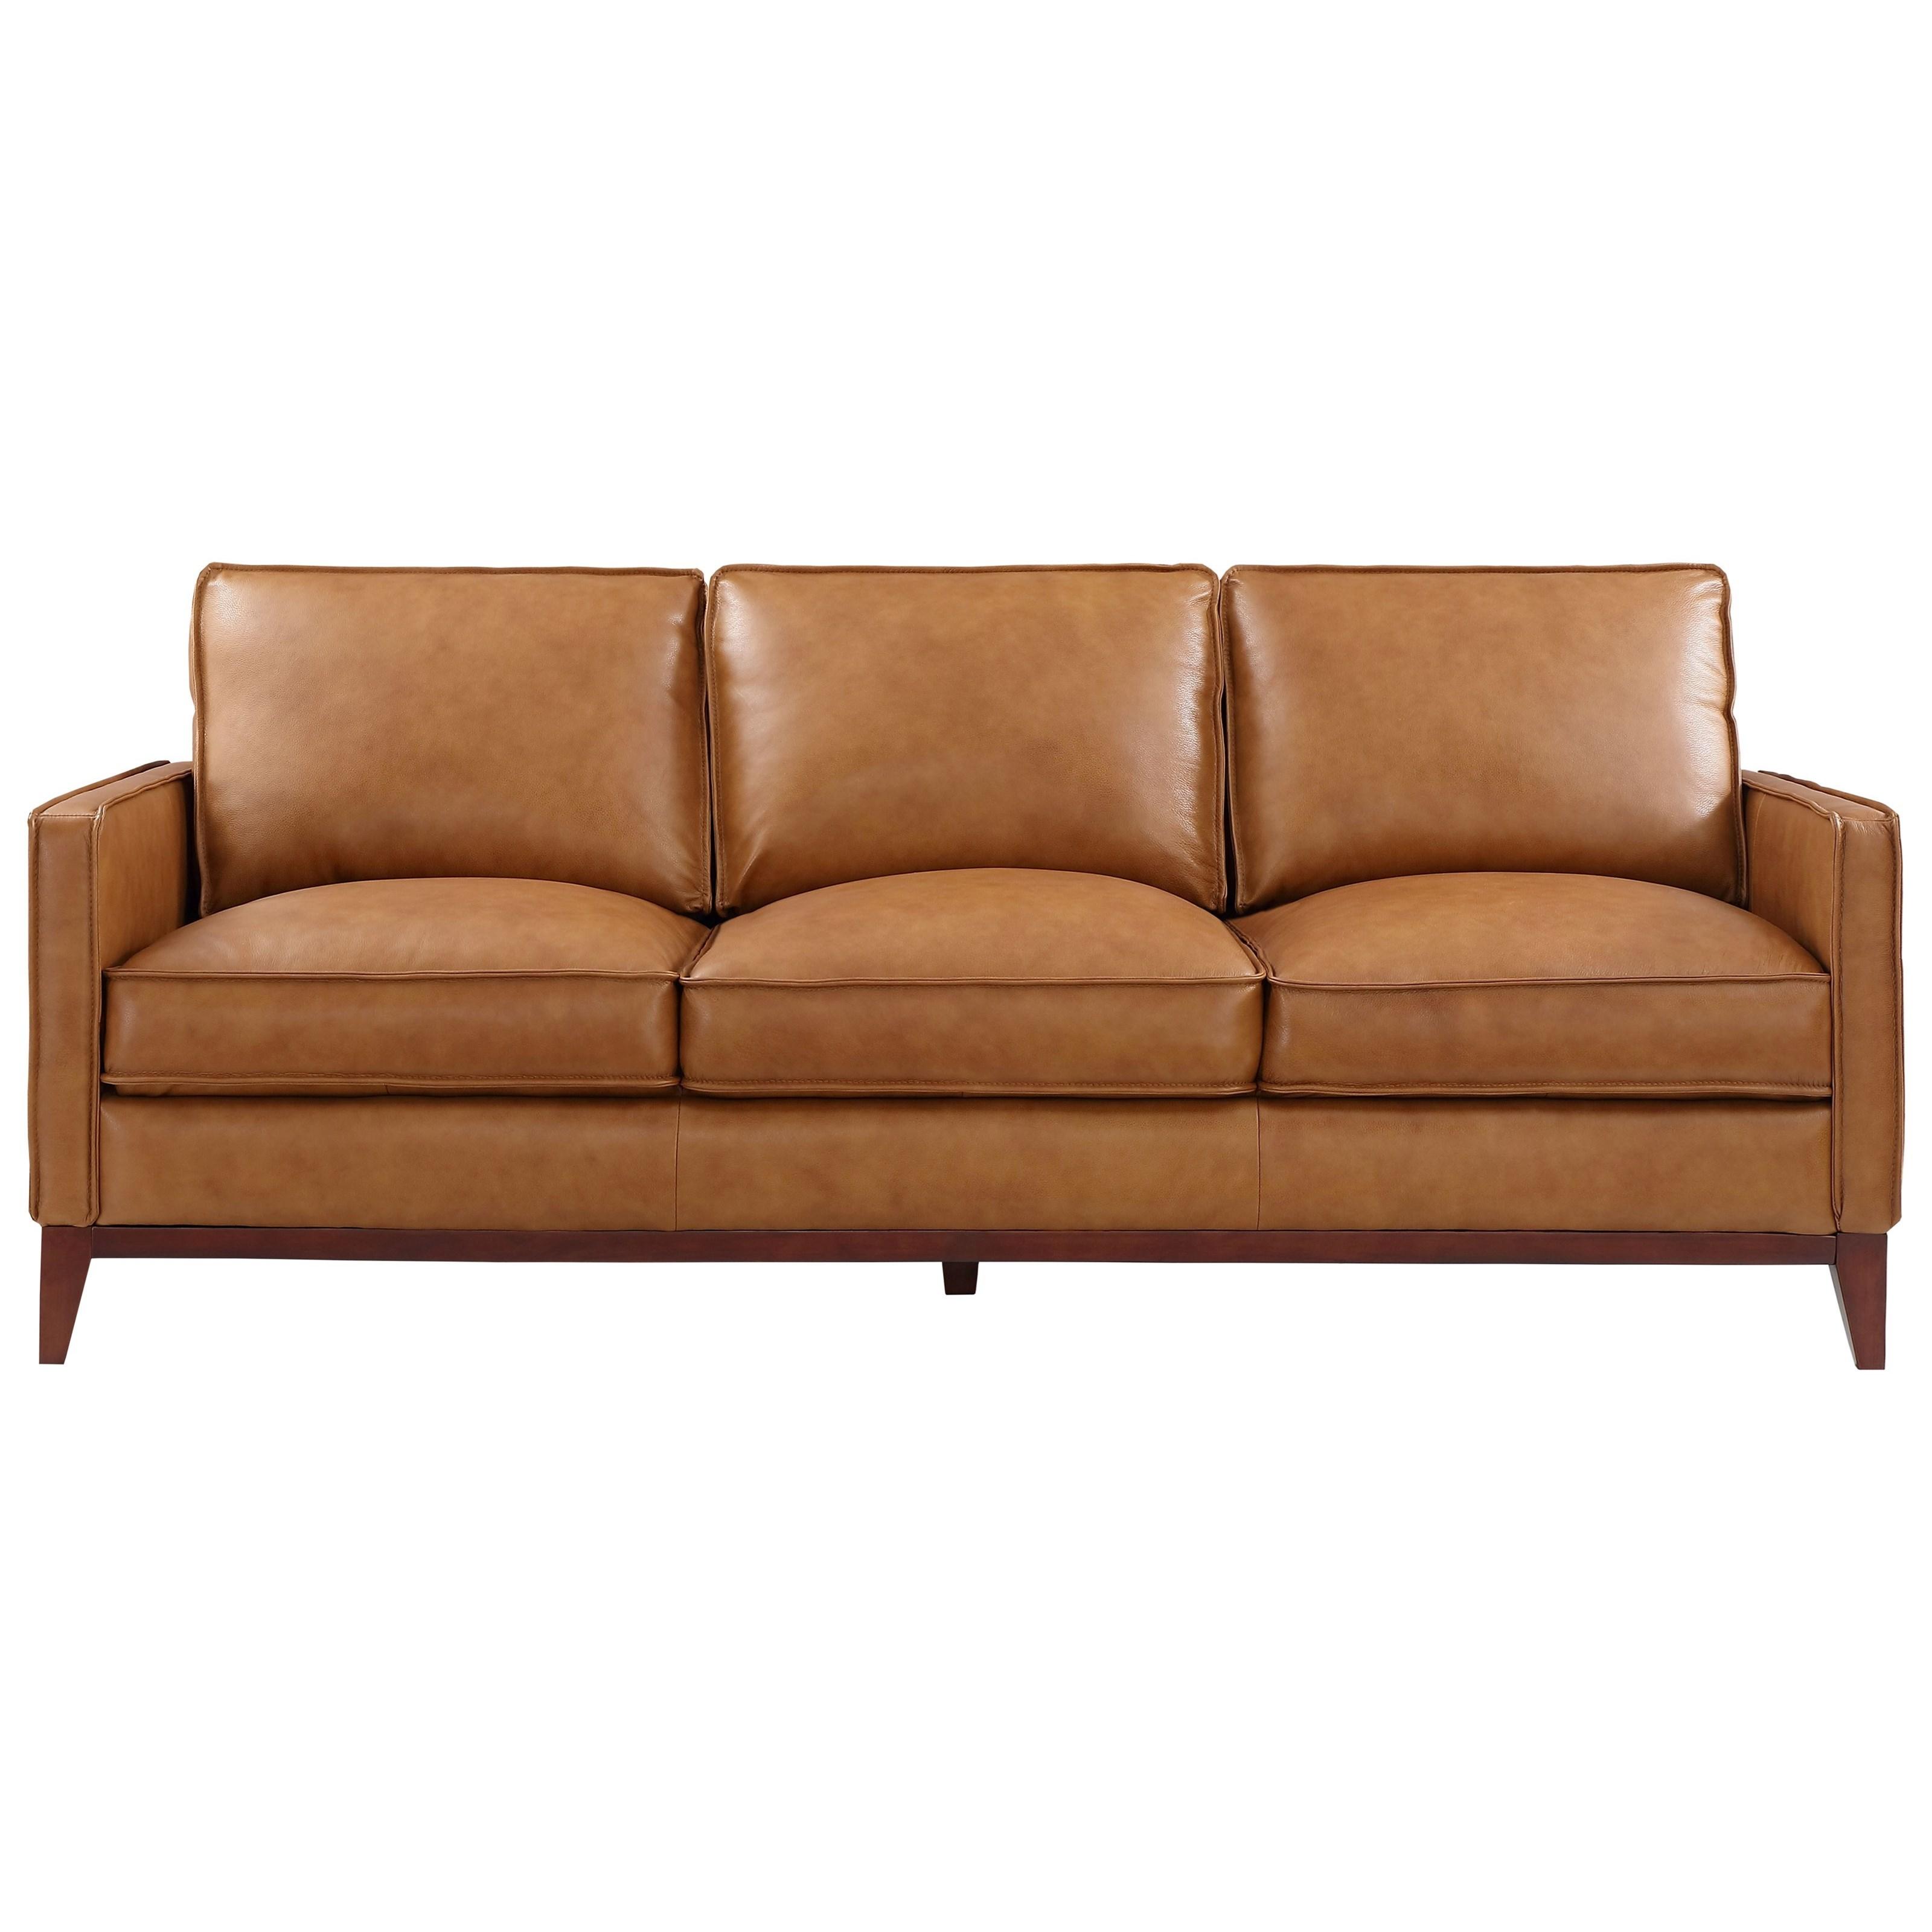 Newport Sofa by Leather Italia USA at Johnny Janosik